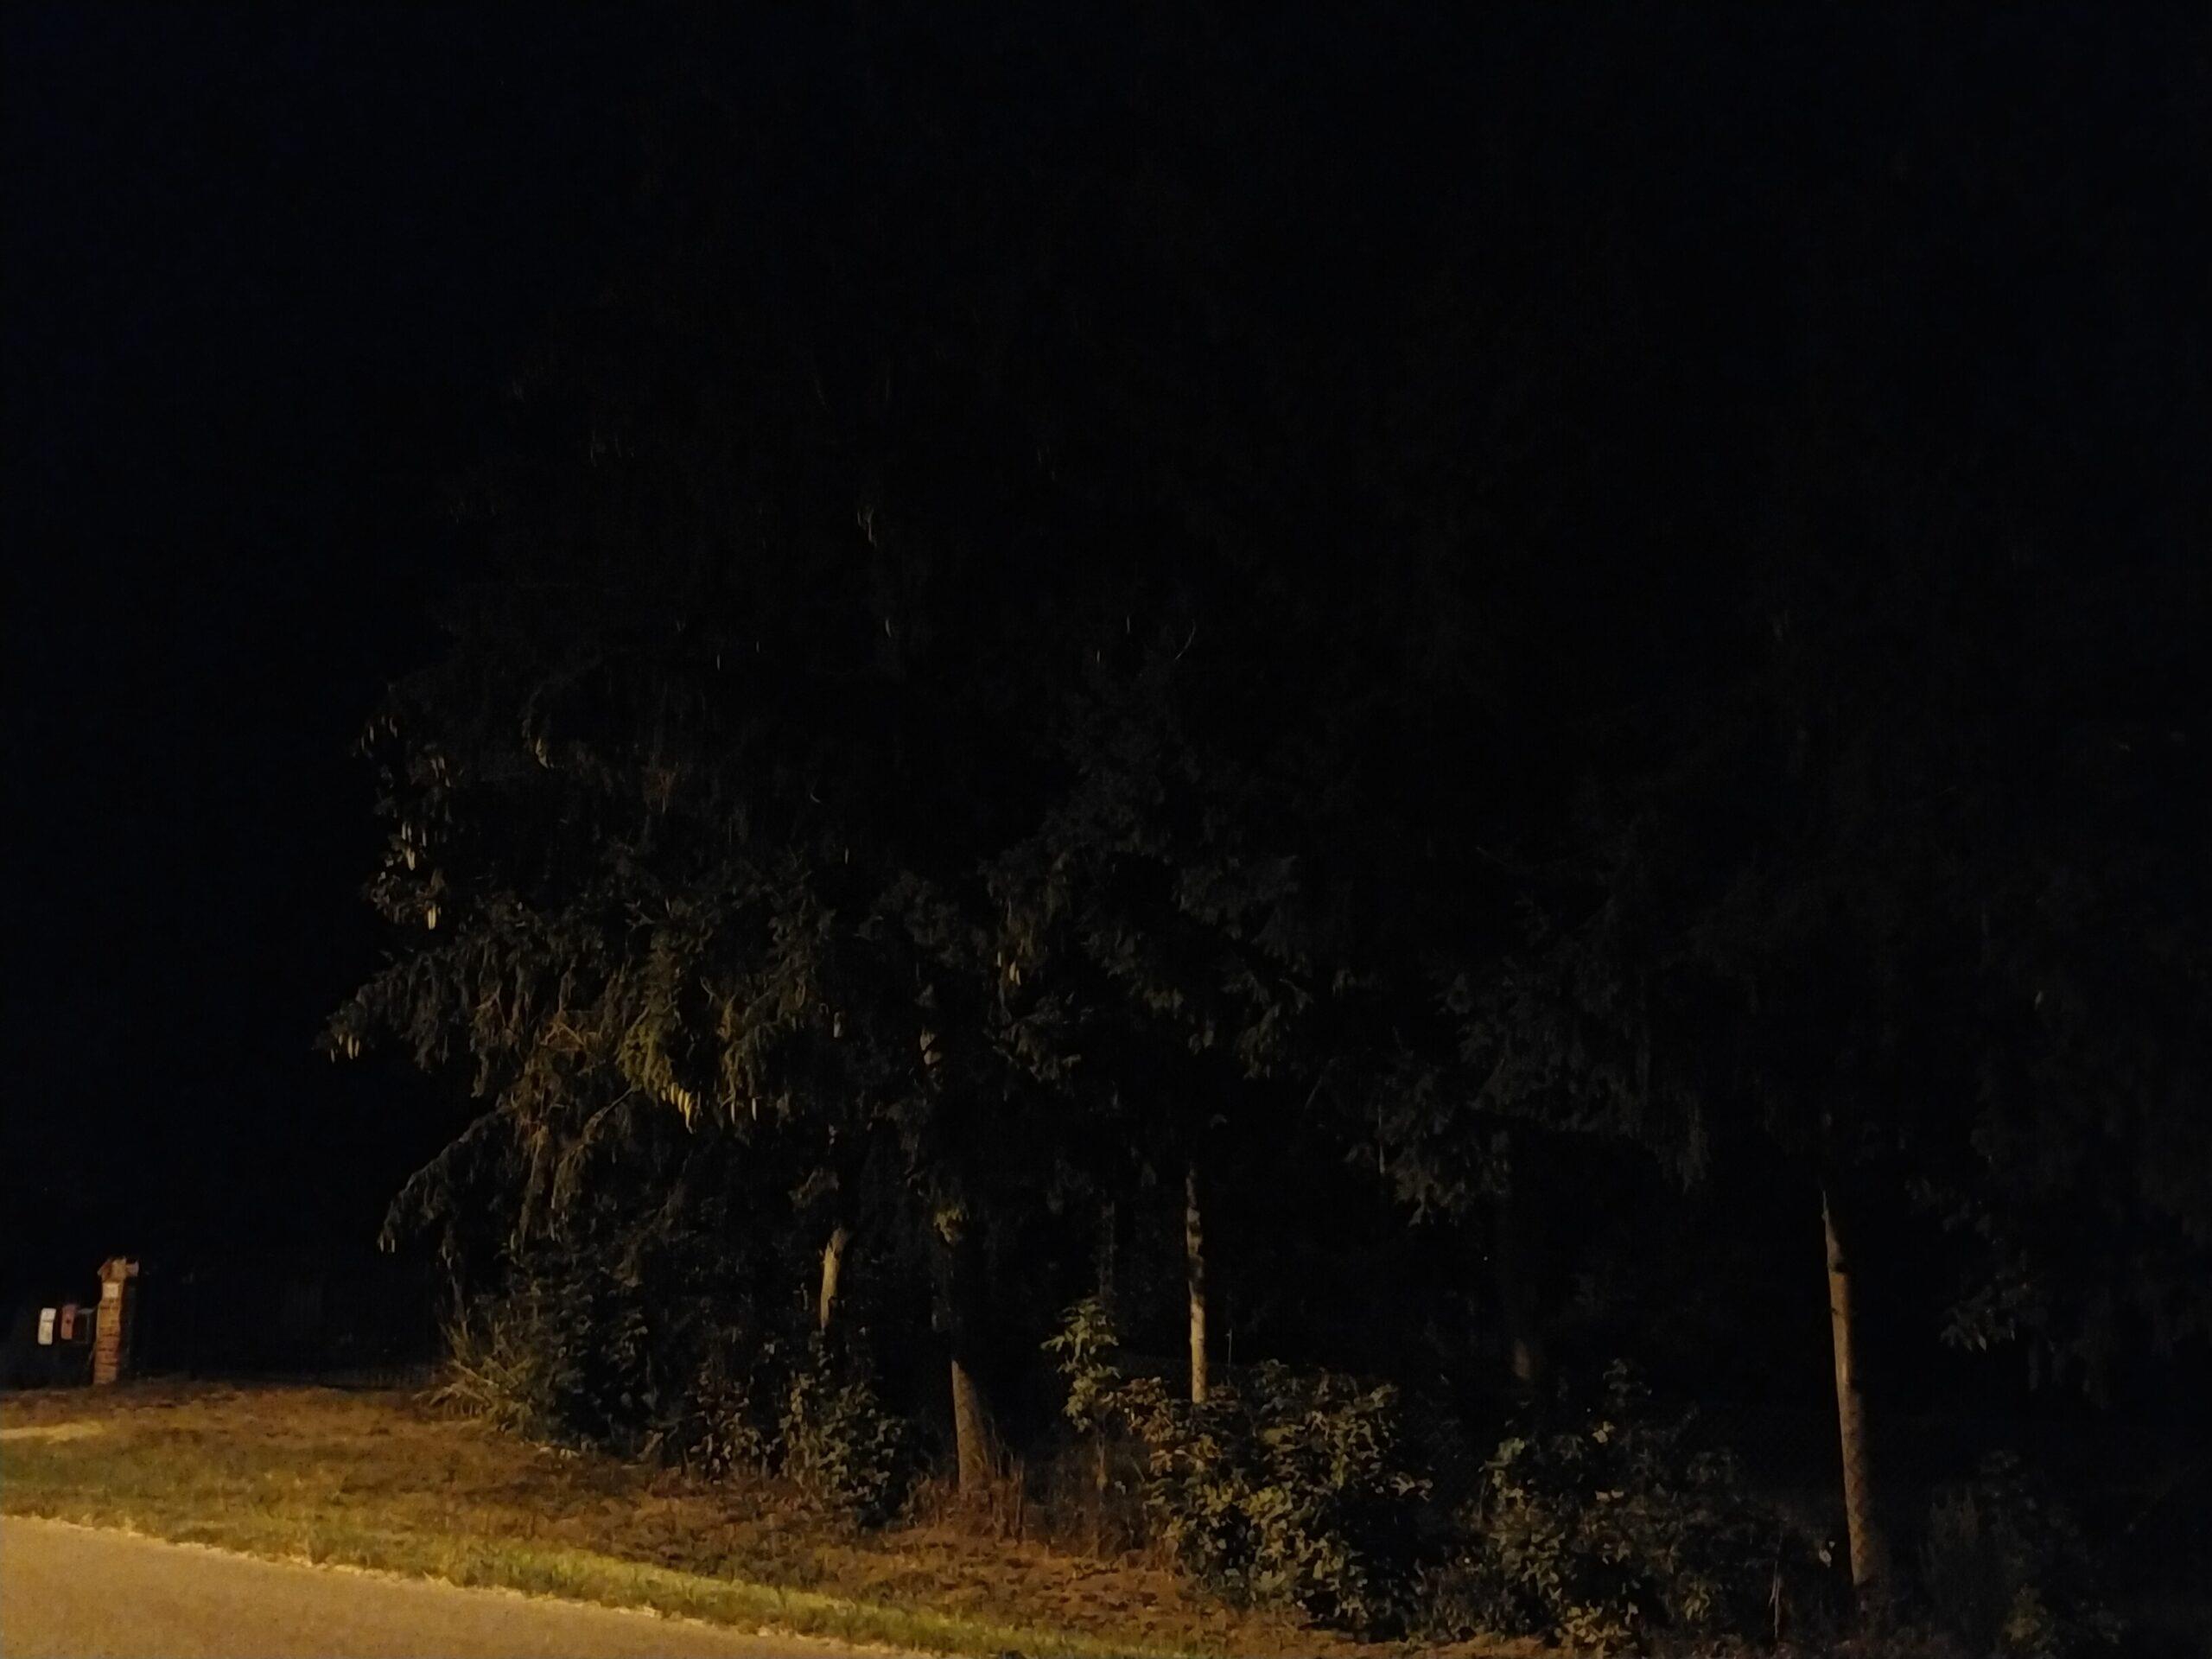 OPPO A72 - main107 - Night